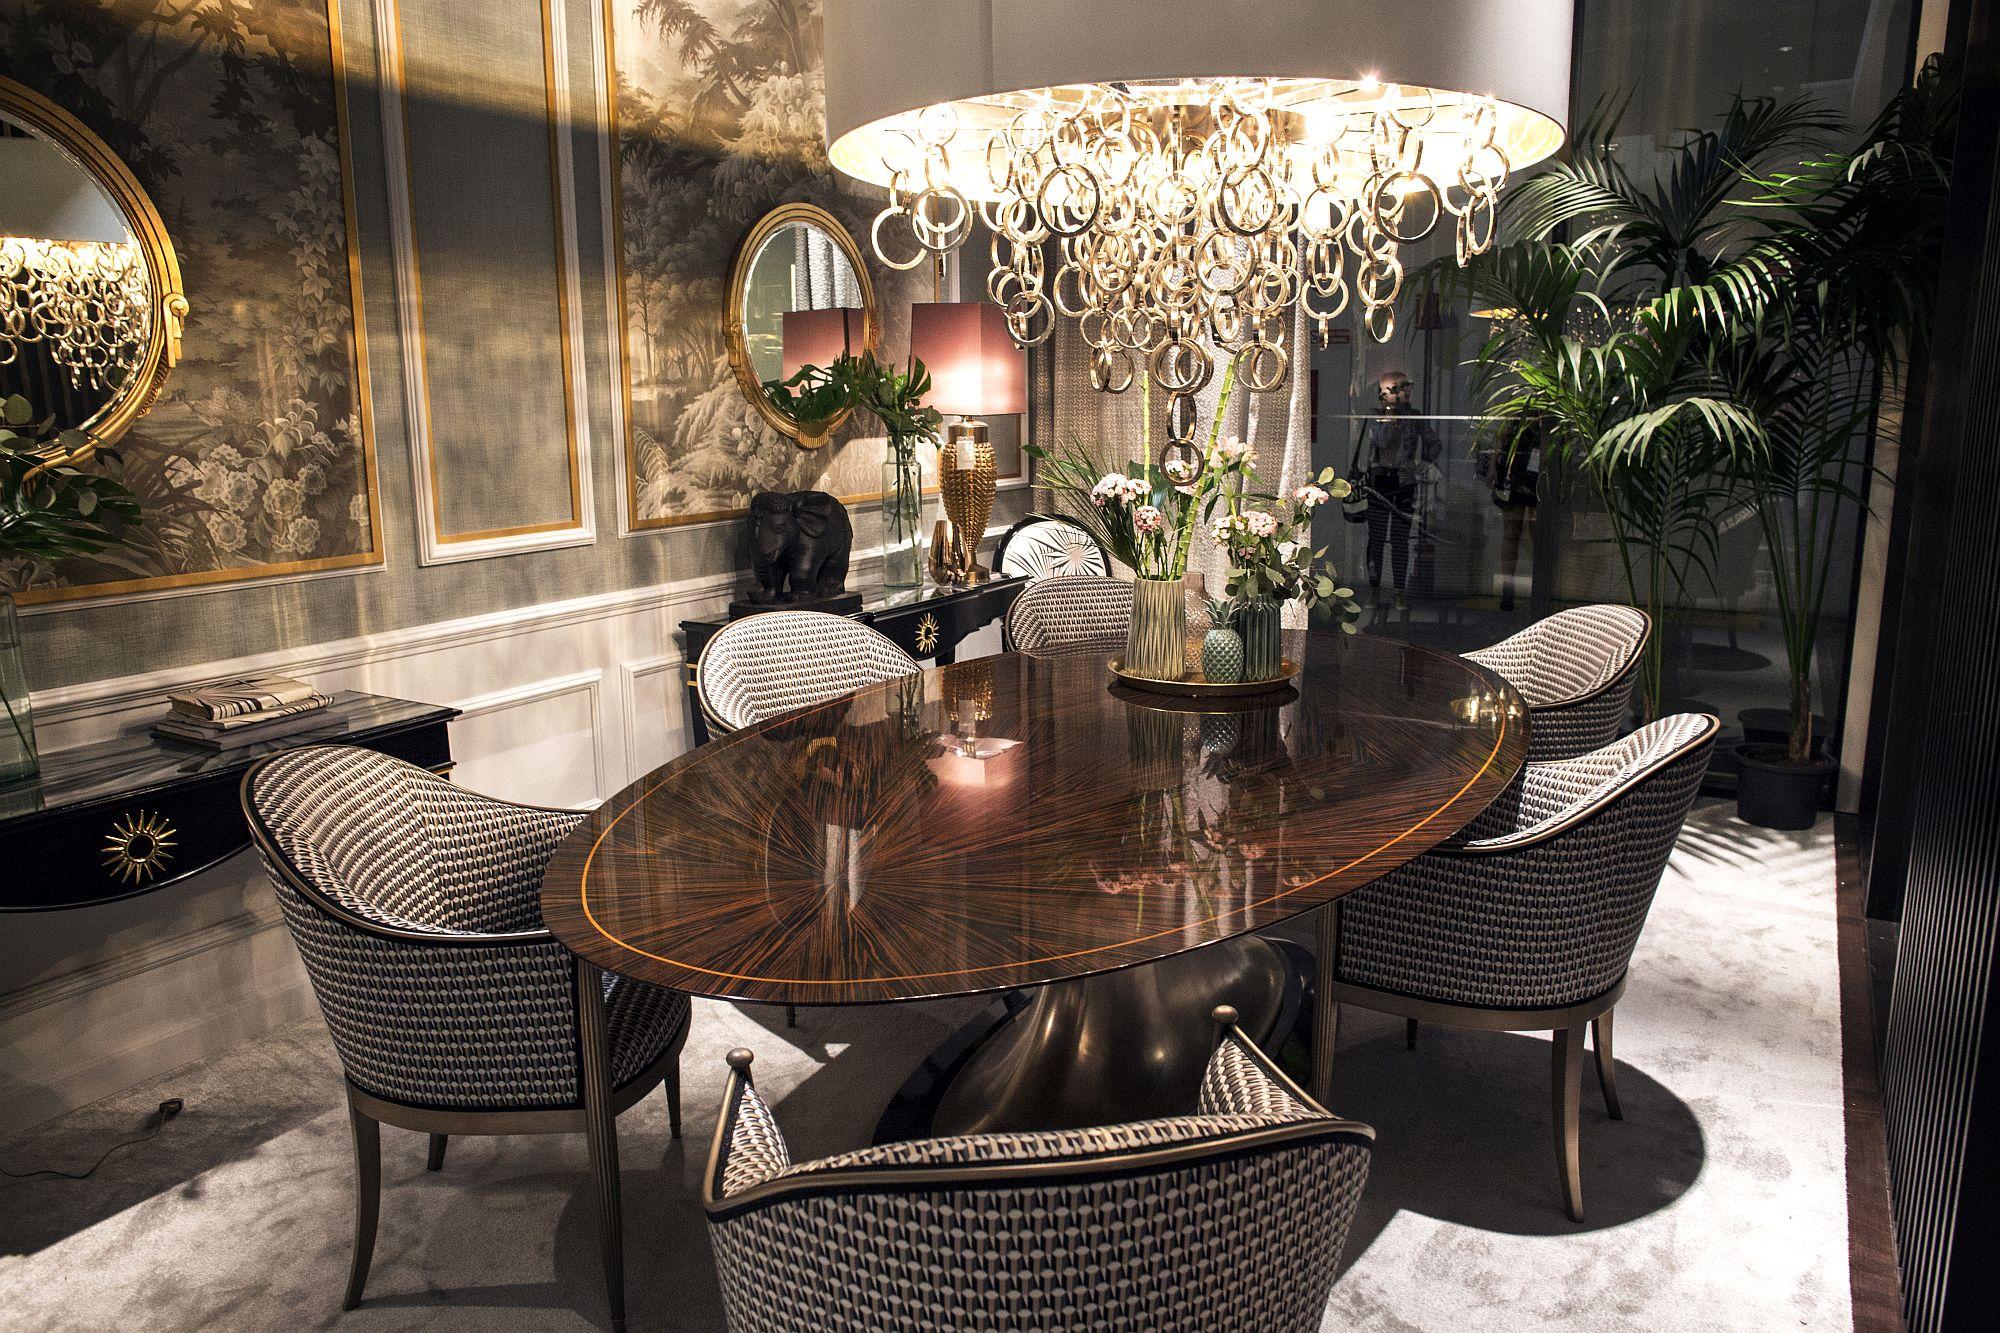 Modern-dining-room-aesthetics-with-stunning-lighting-and-plenty-of-elegance